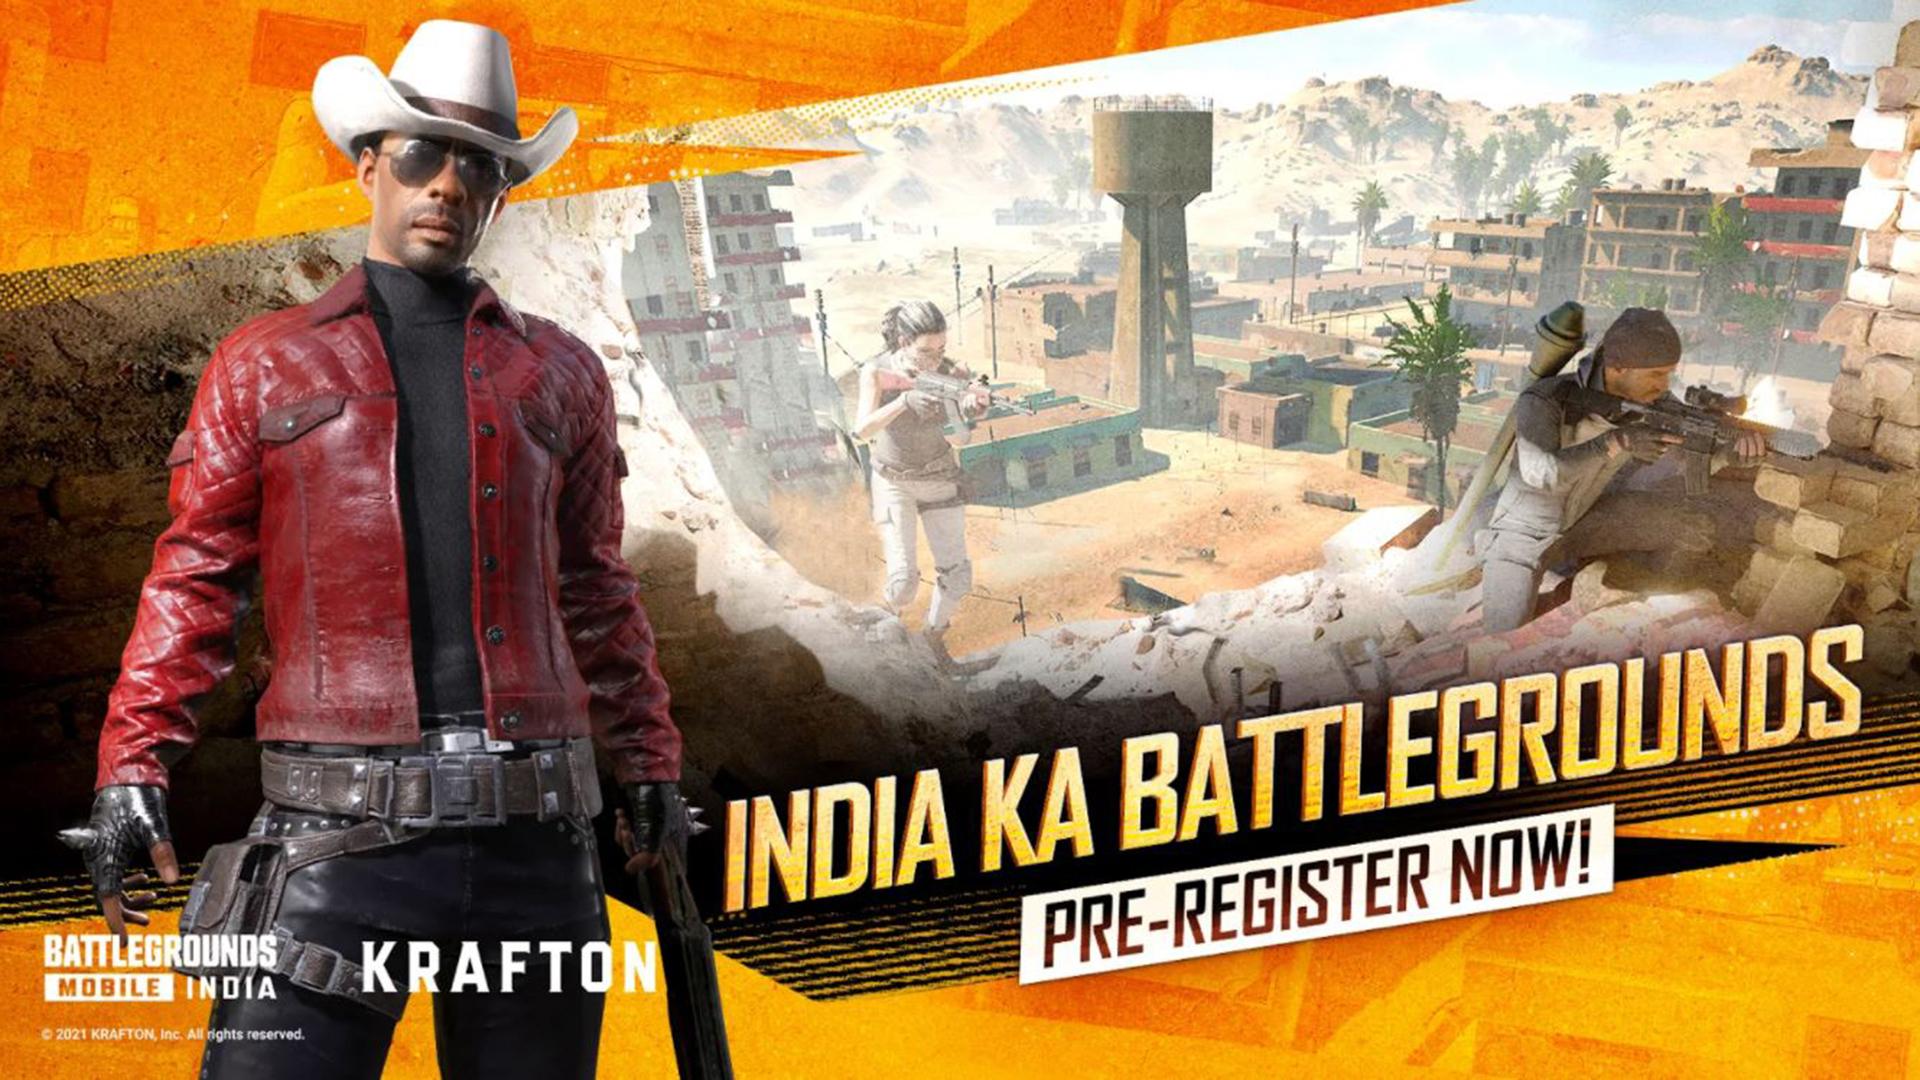 Battlegrounds Mobile India Karakin promo